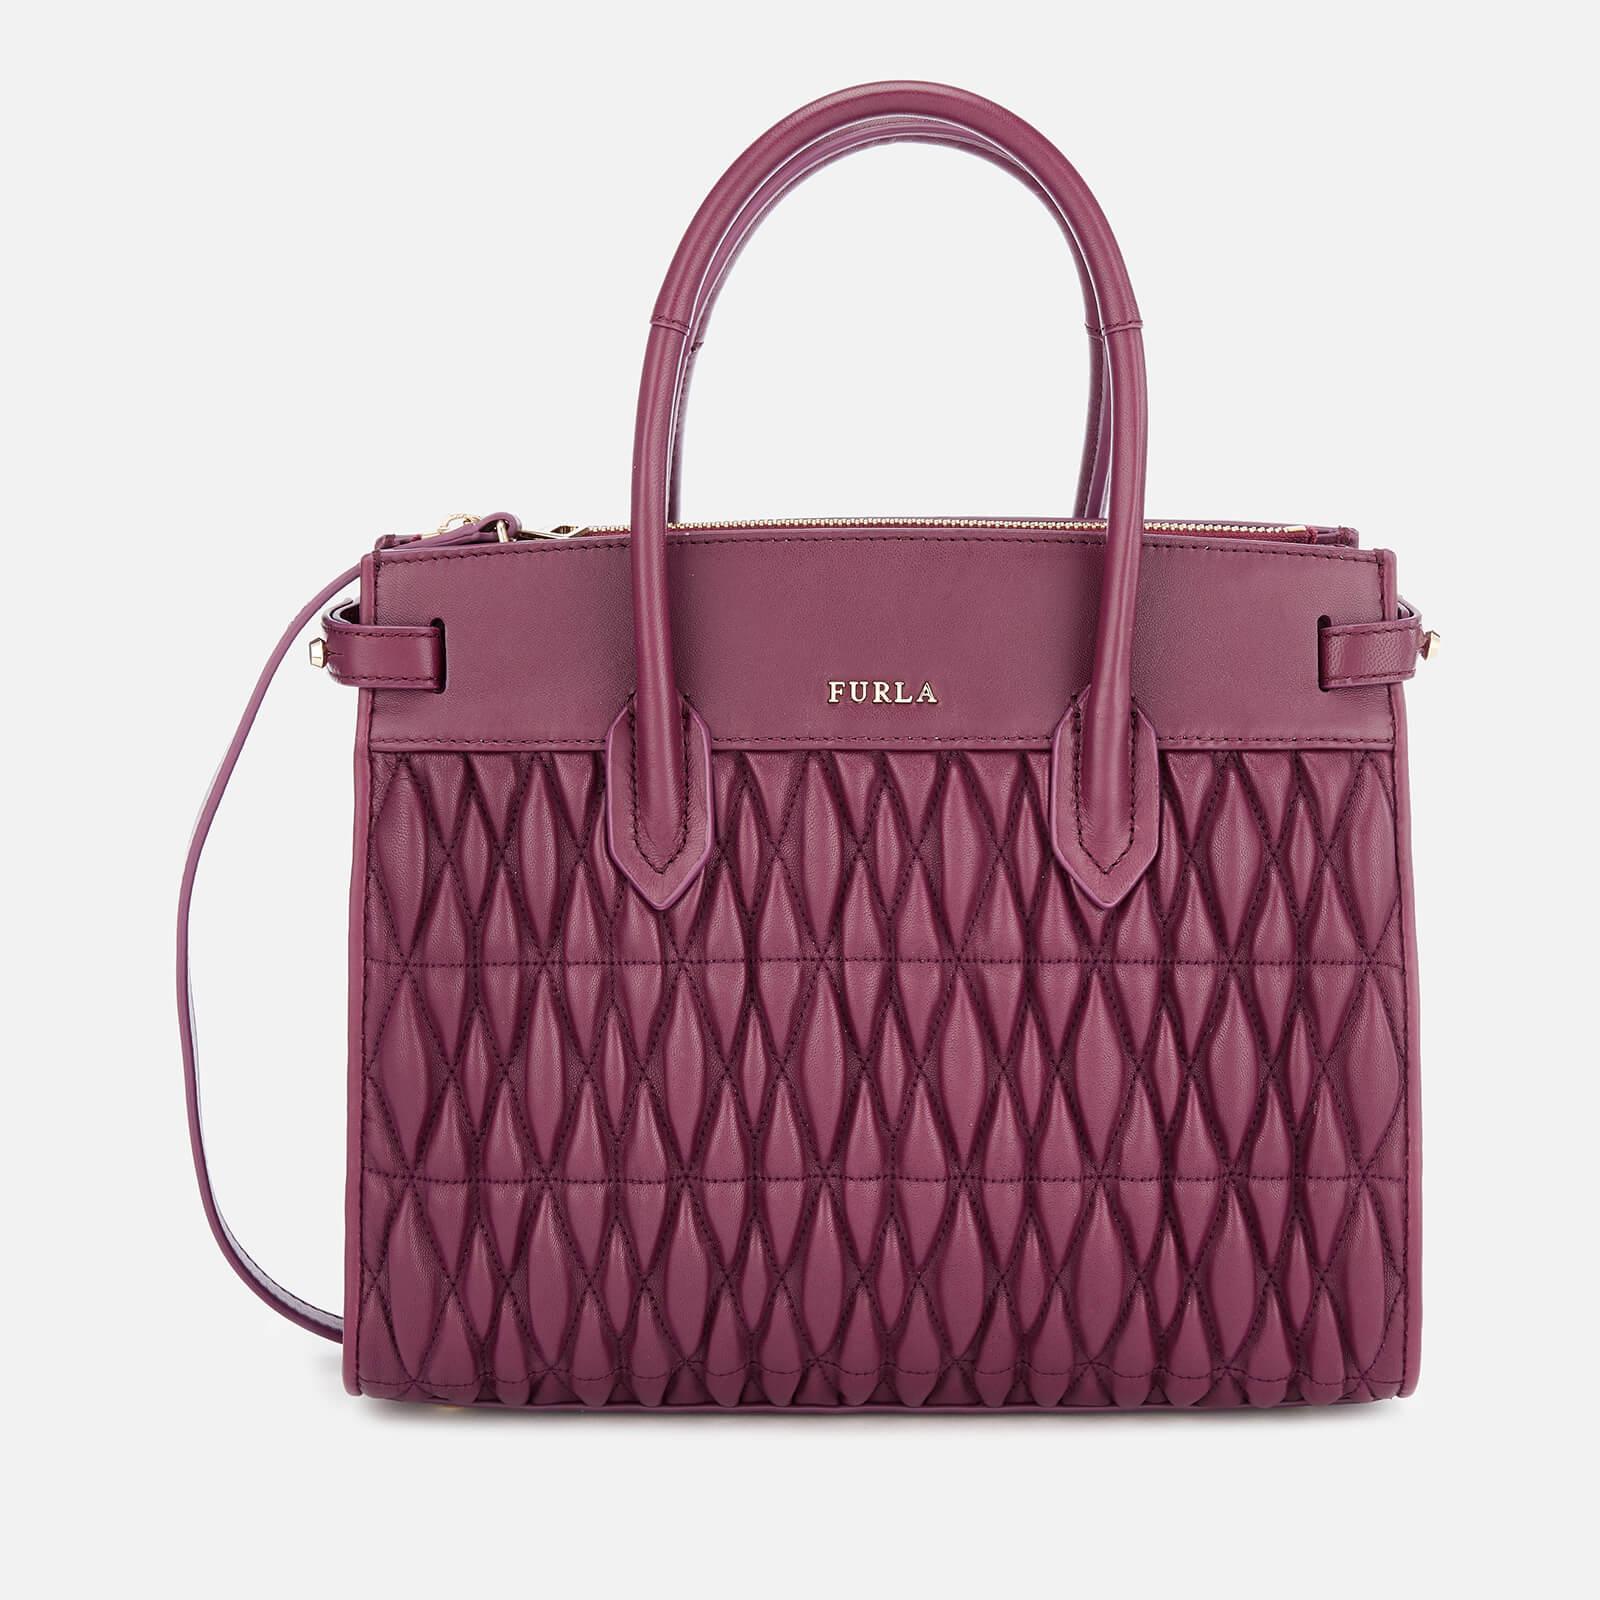 72990be3cda Furla Women's Pin Cometa Small Tote Bag - Purple